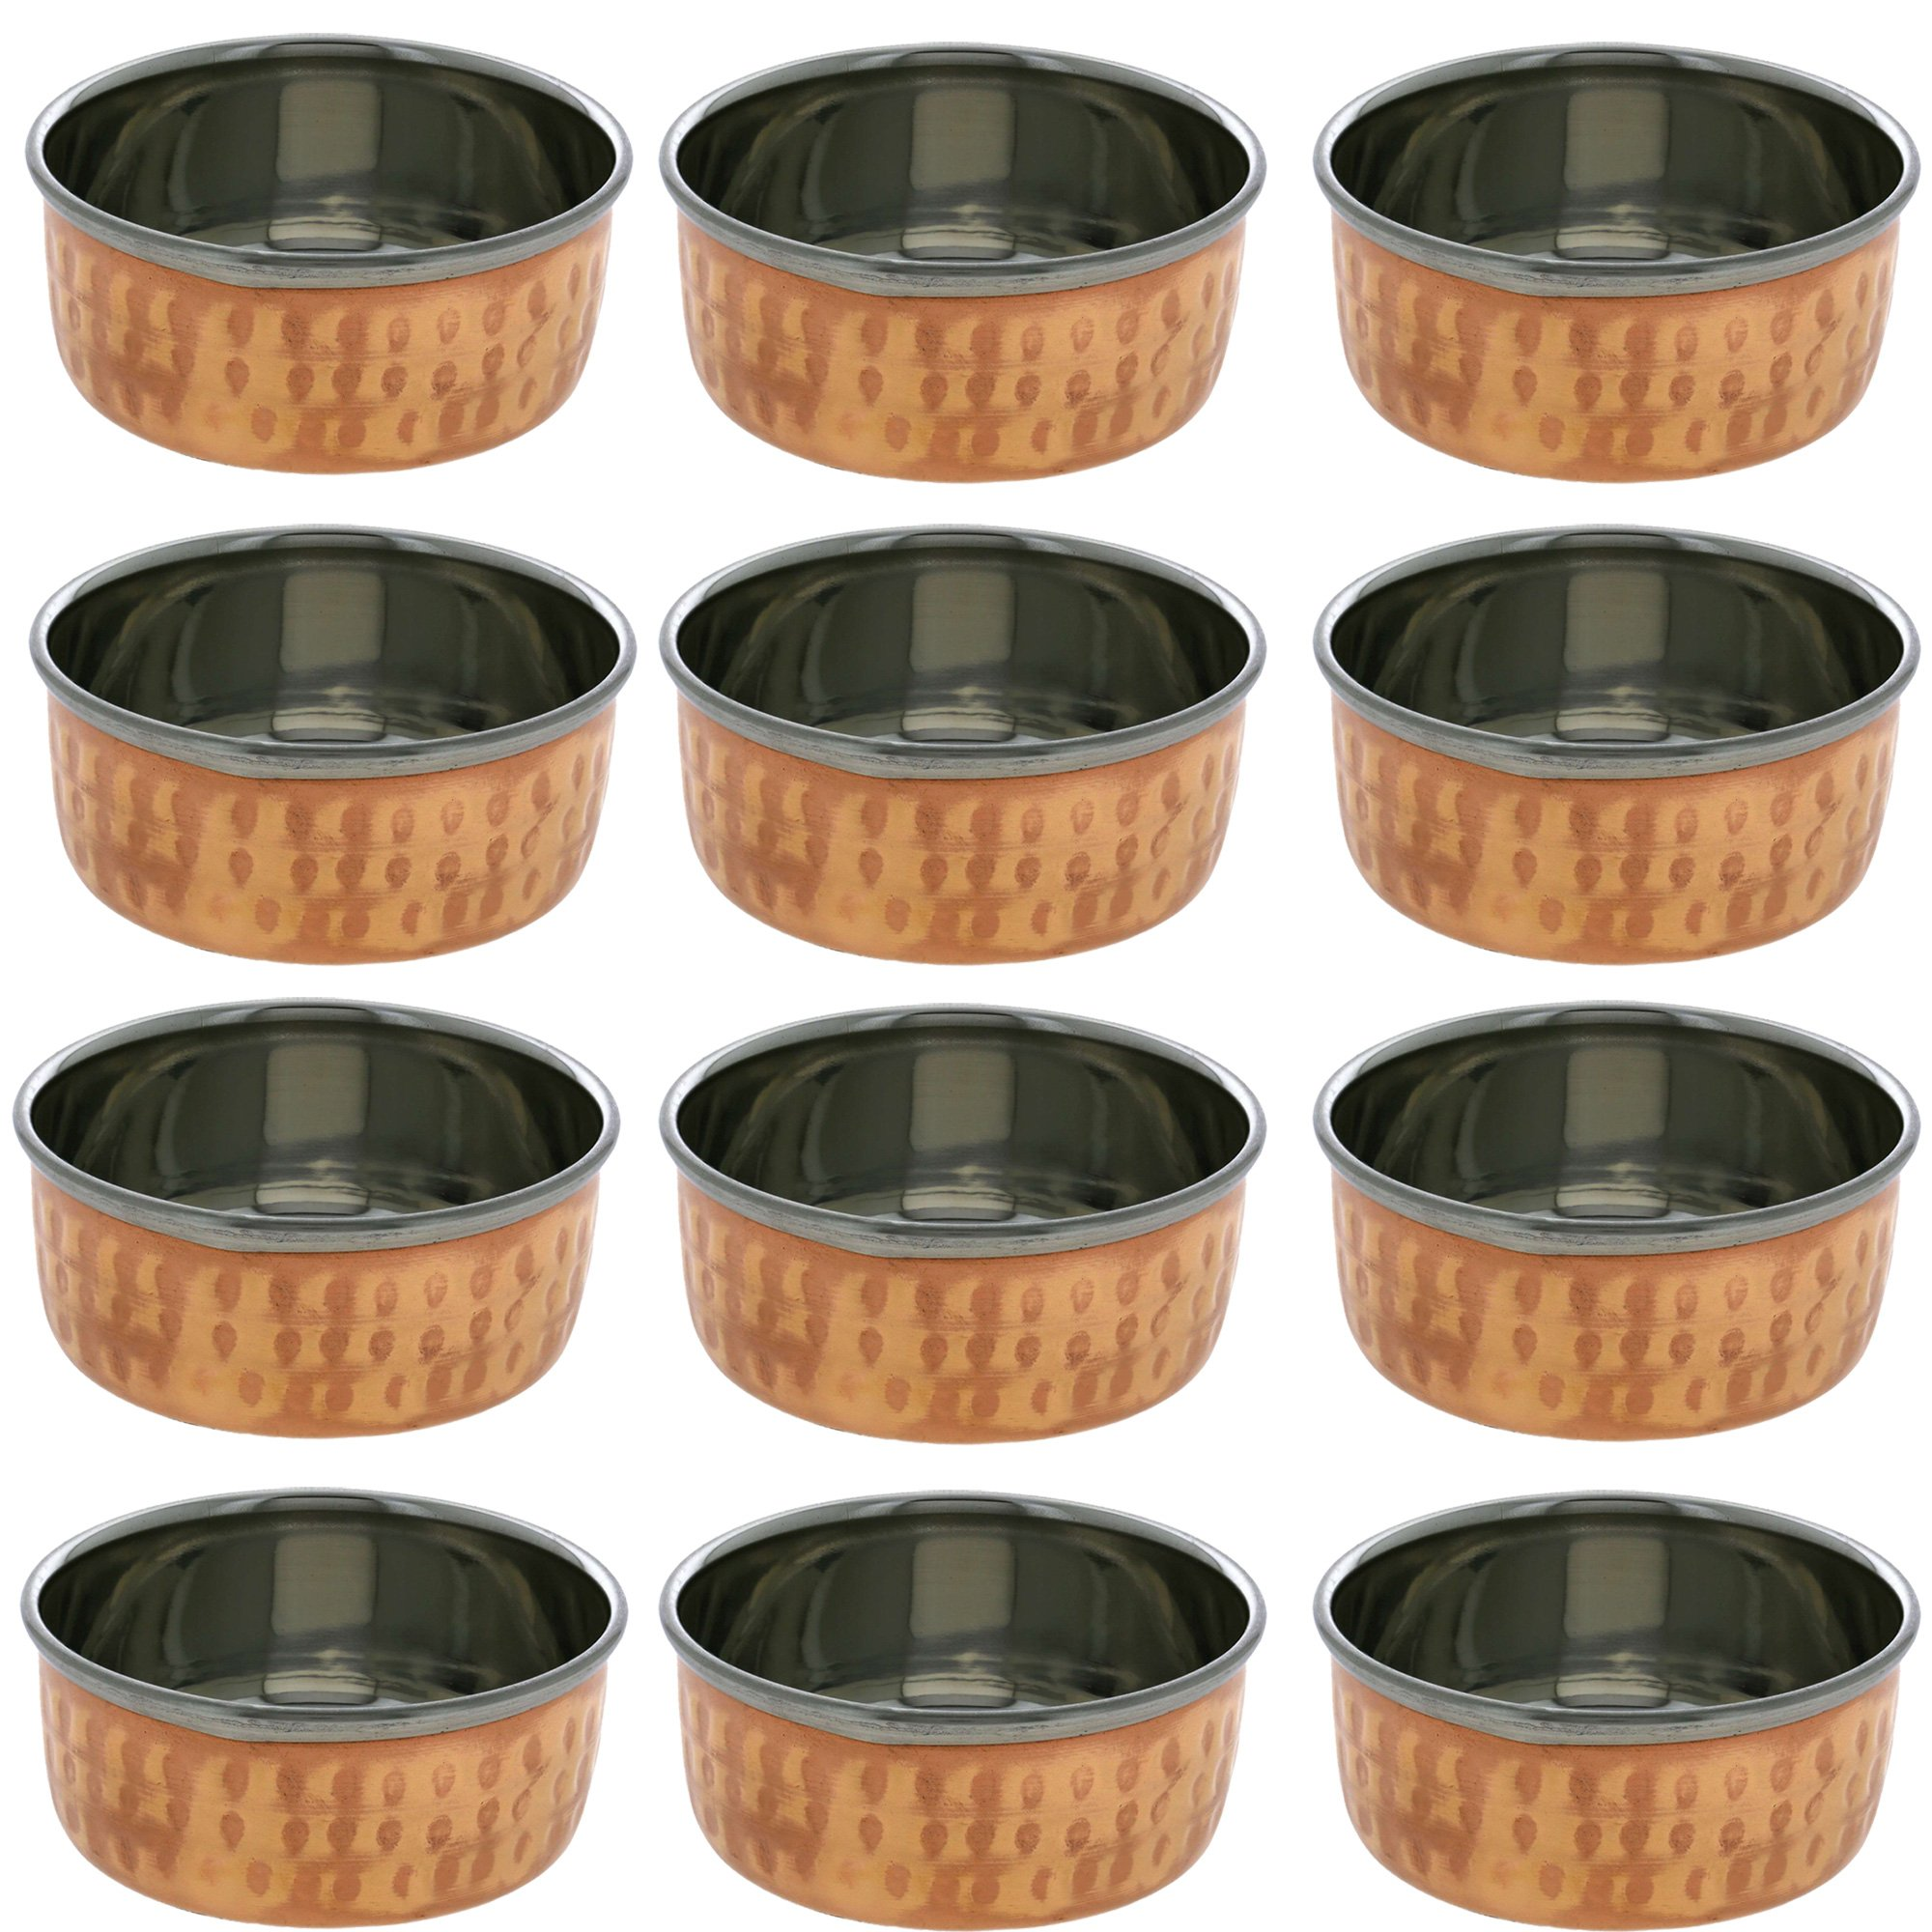 Copper Dinnerware Stainless Steel Dessert Bowl 6oz (12)